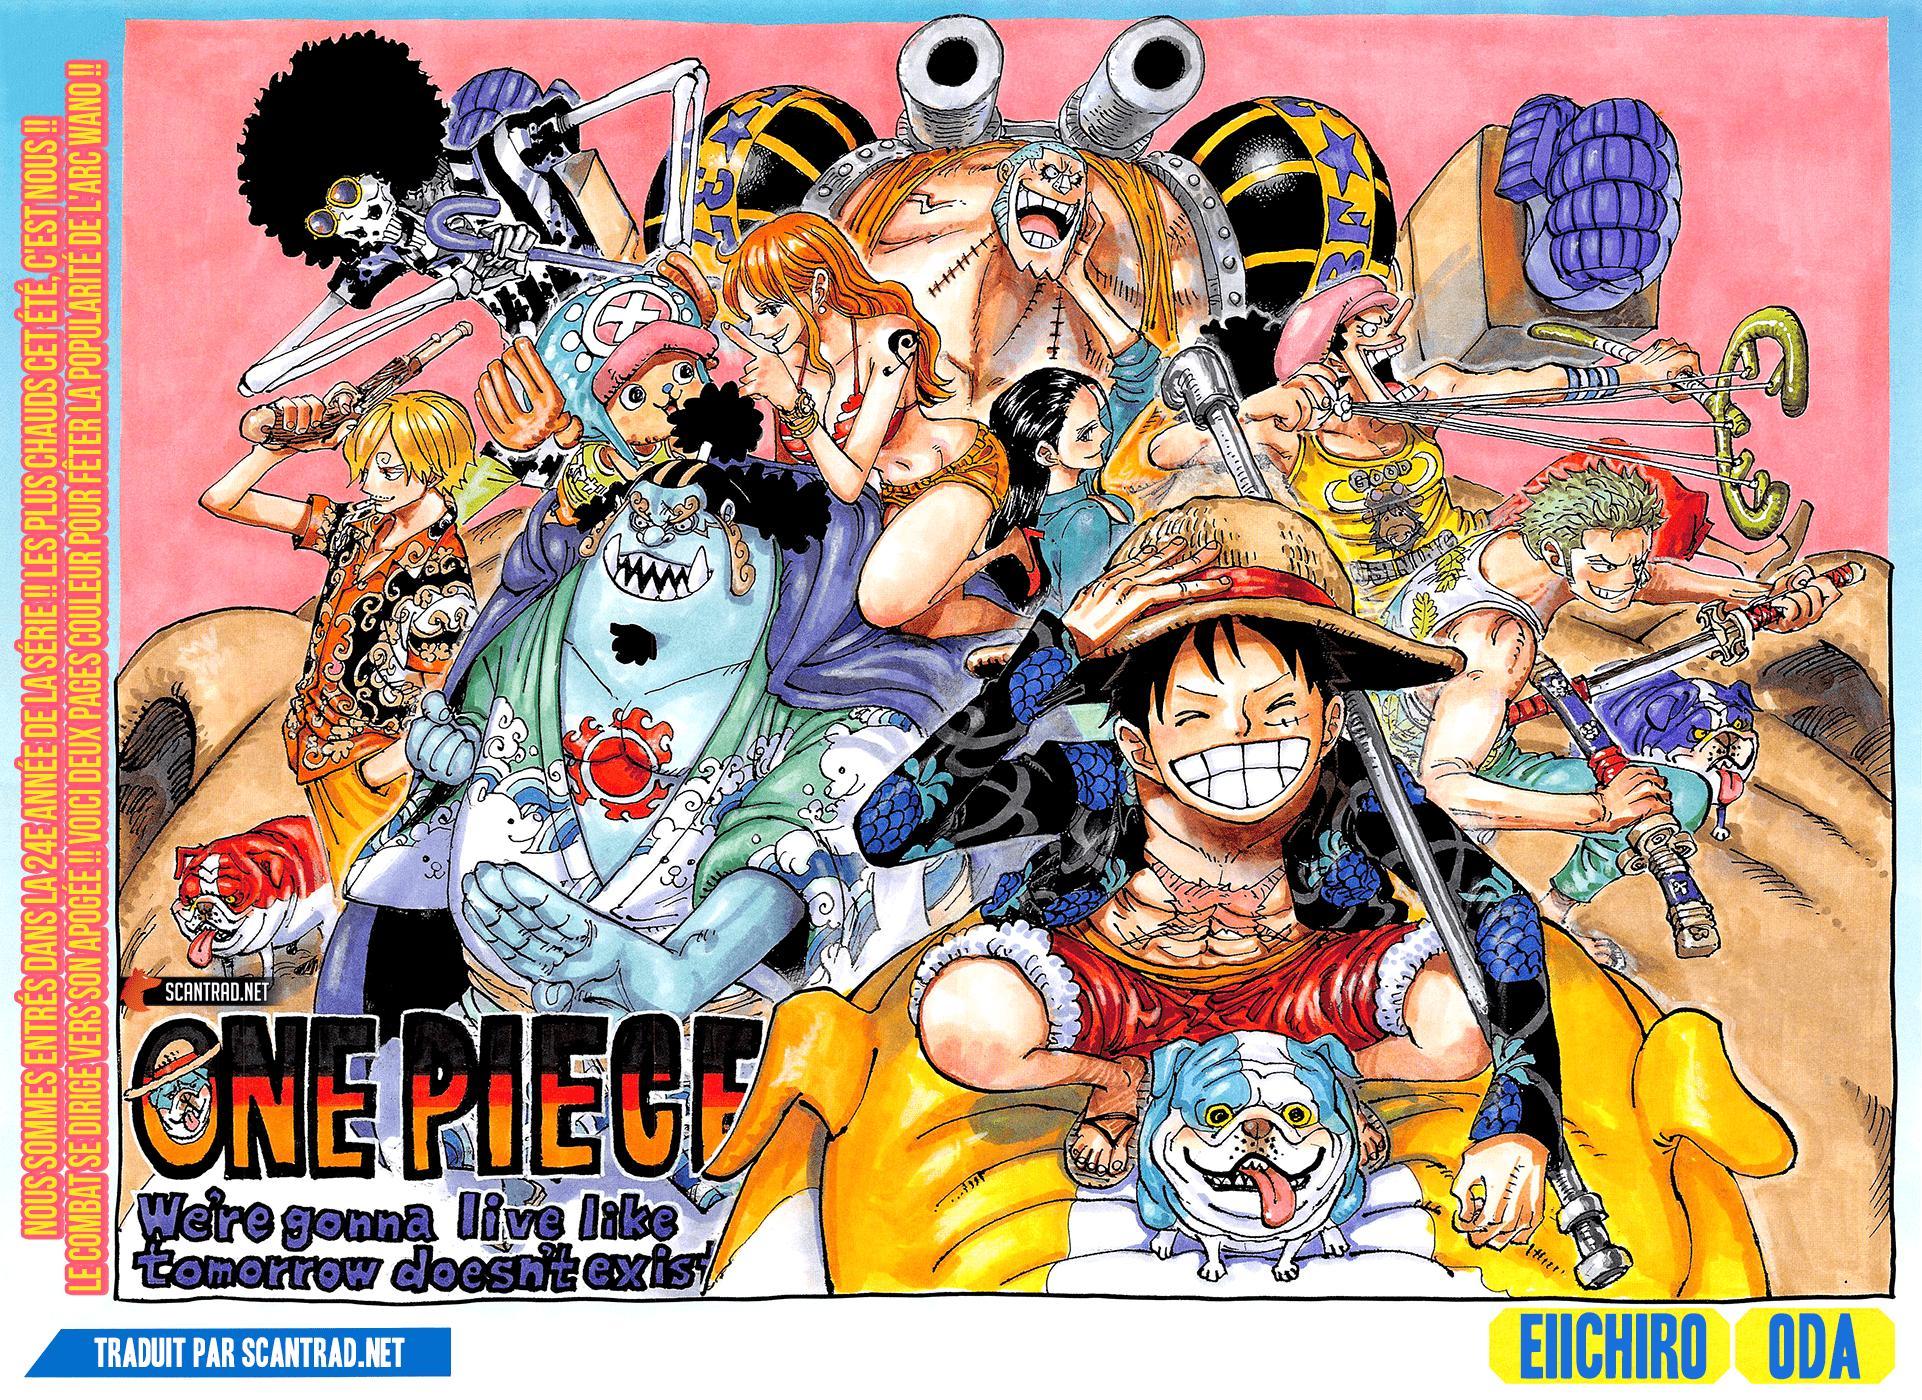 One Piece Manga 987 [Inglés] 01